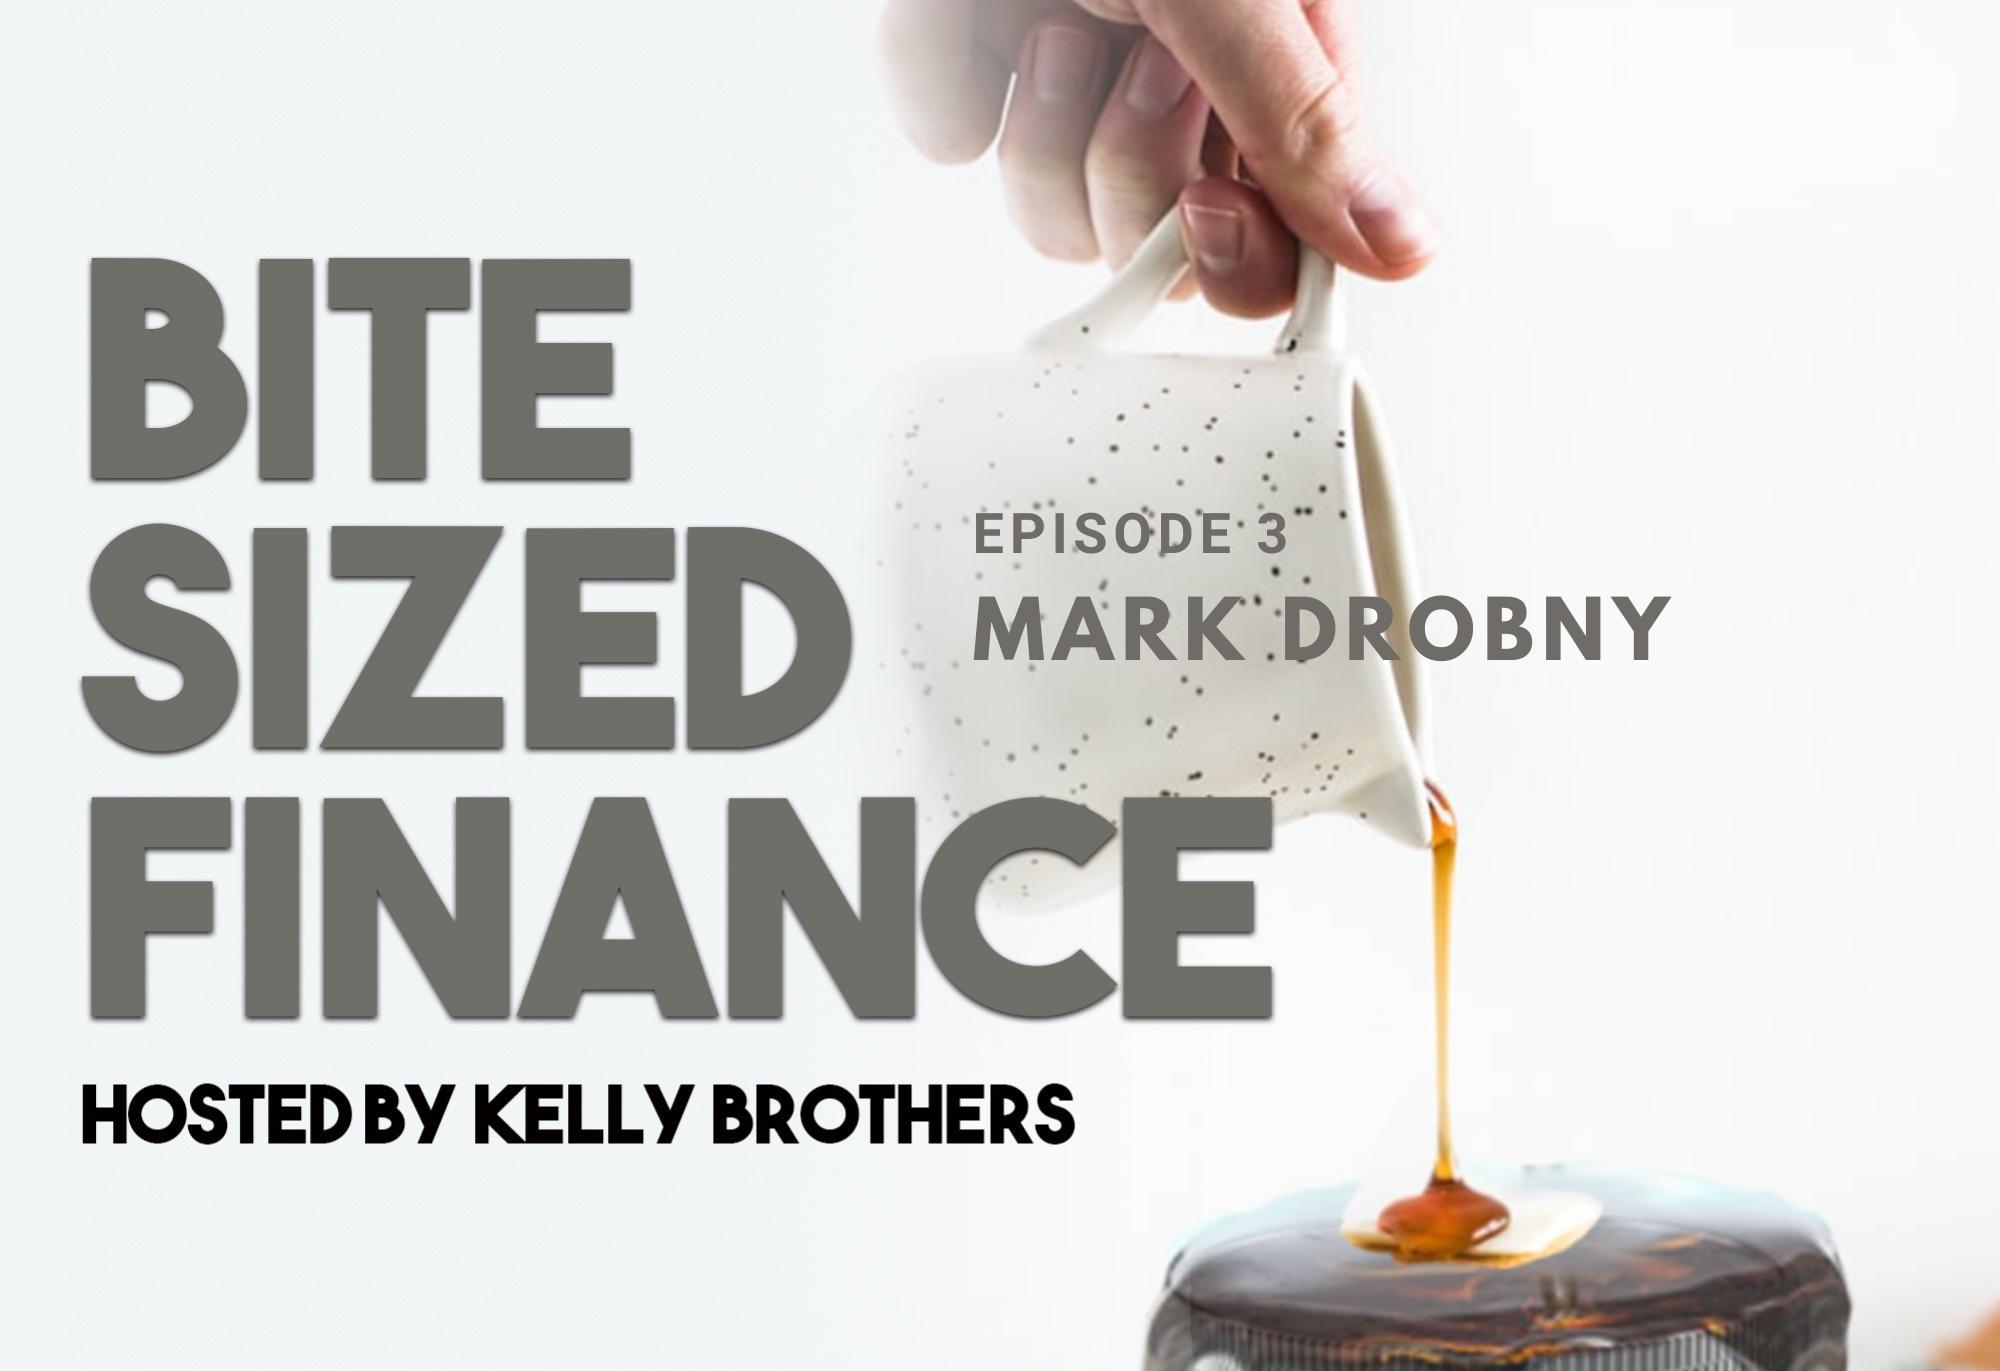 Episode 3 - Mark Drobny Thumbnail